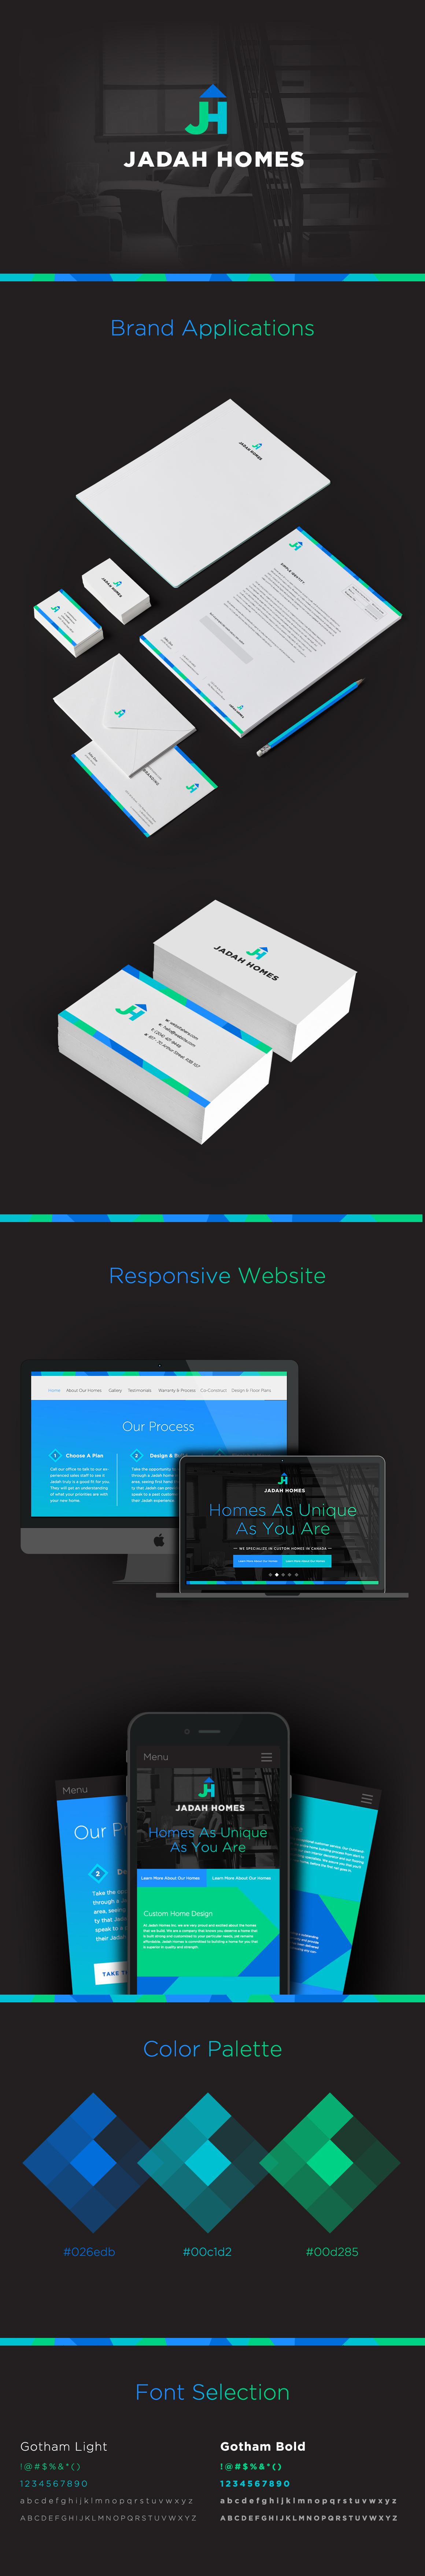 Verda-design-web-design.jpg